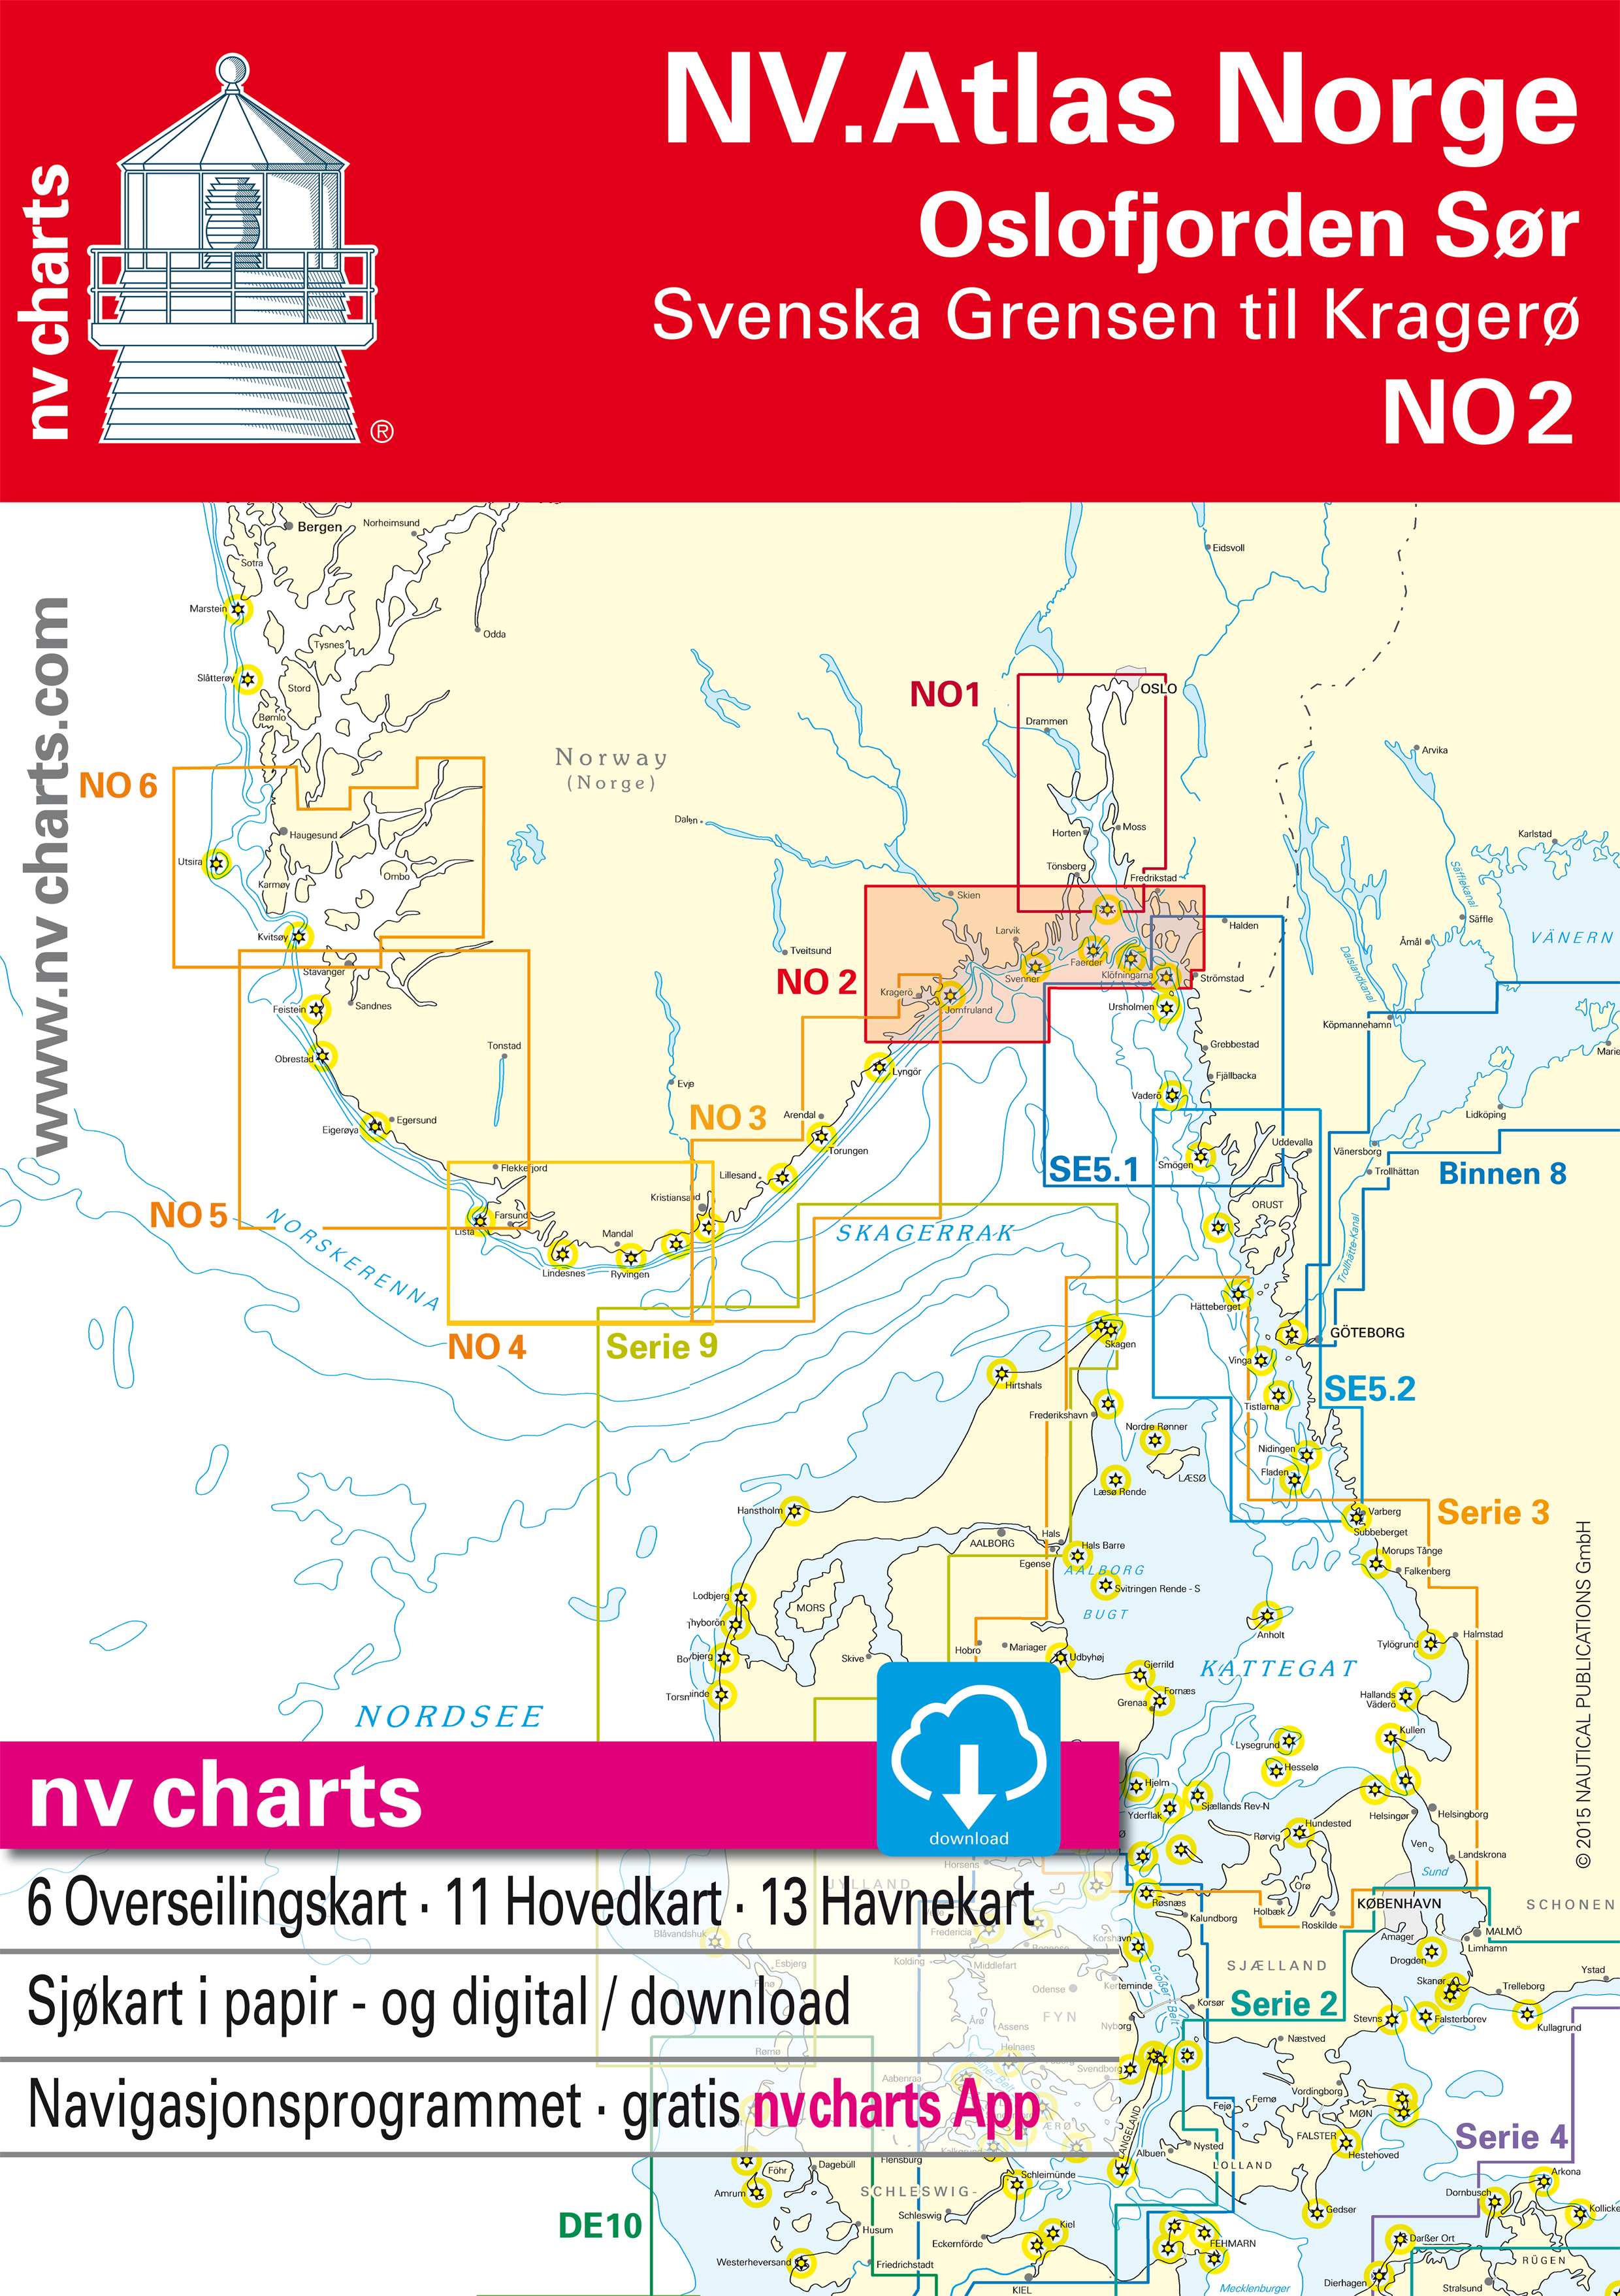 NV NO2: Norway Oslofjord South - Svenska Grensen to Kragerø